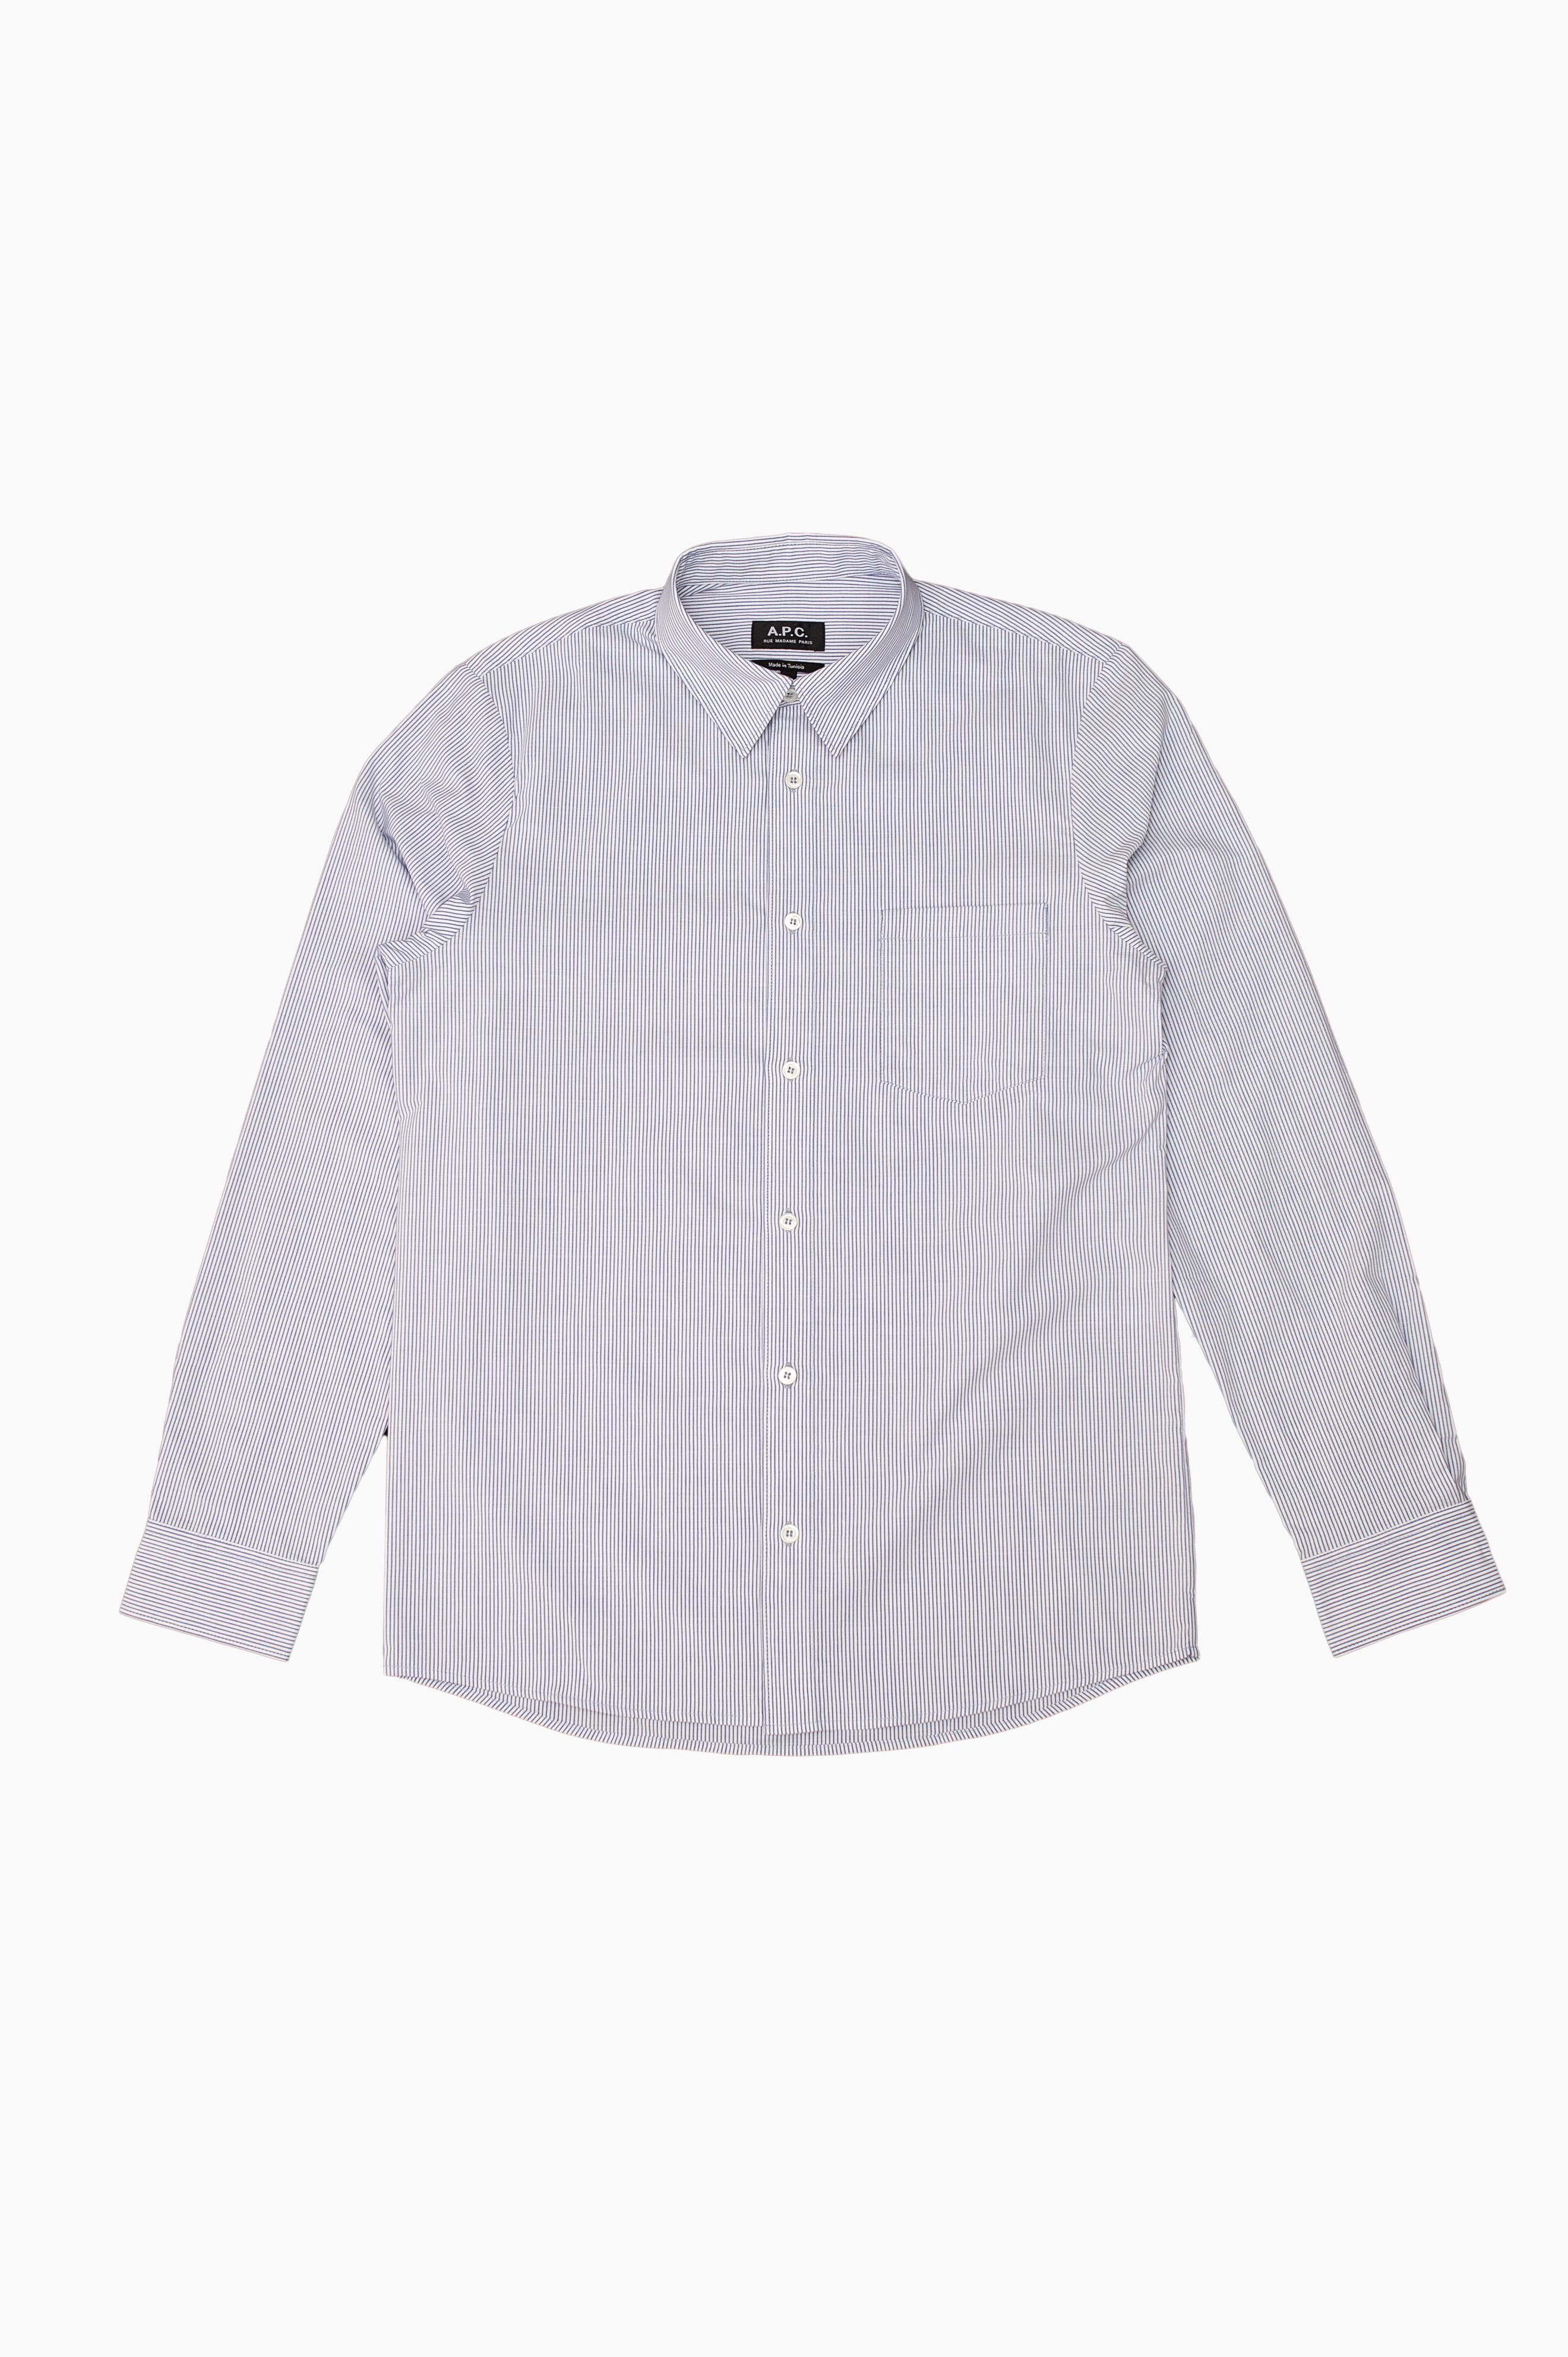 Barthélemy Shirt White